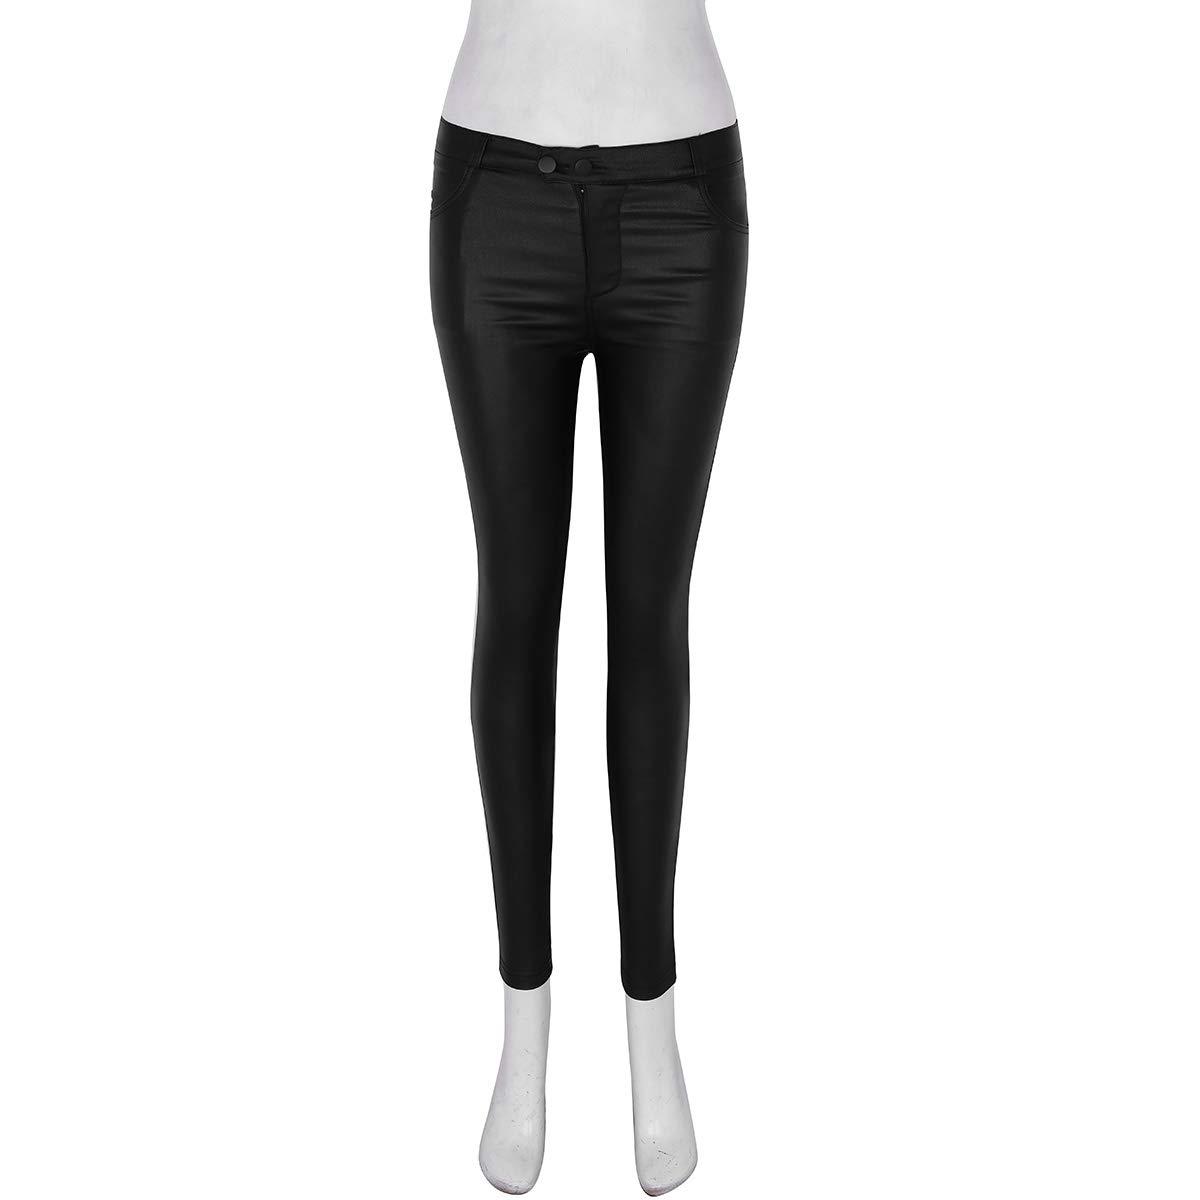 Damen Hohe Taille Leder Hose PU Leggings Stretch Slim Lackleder Bleistift Hosen